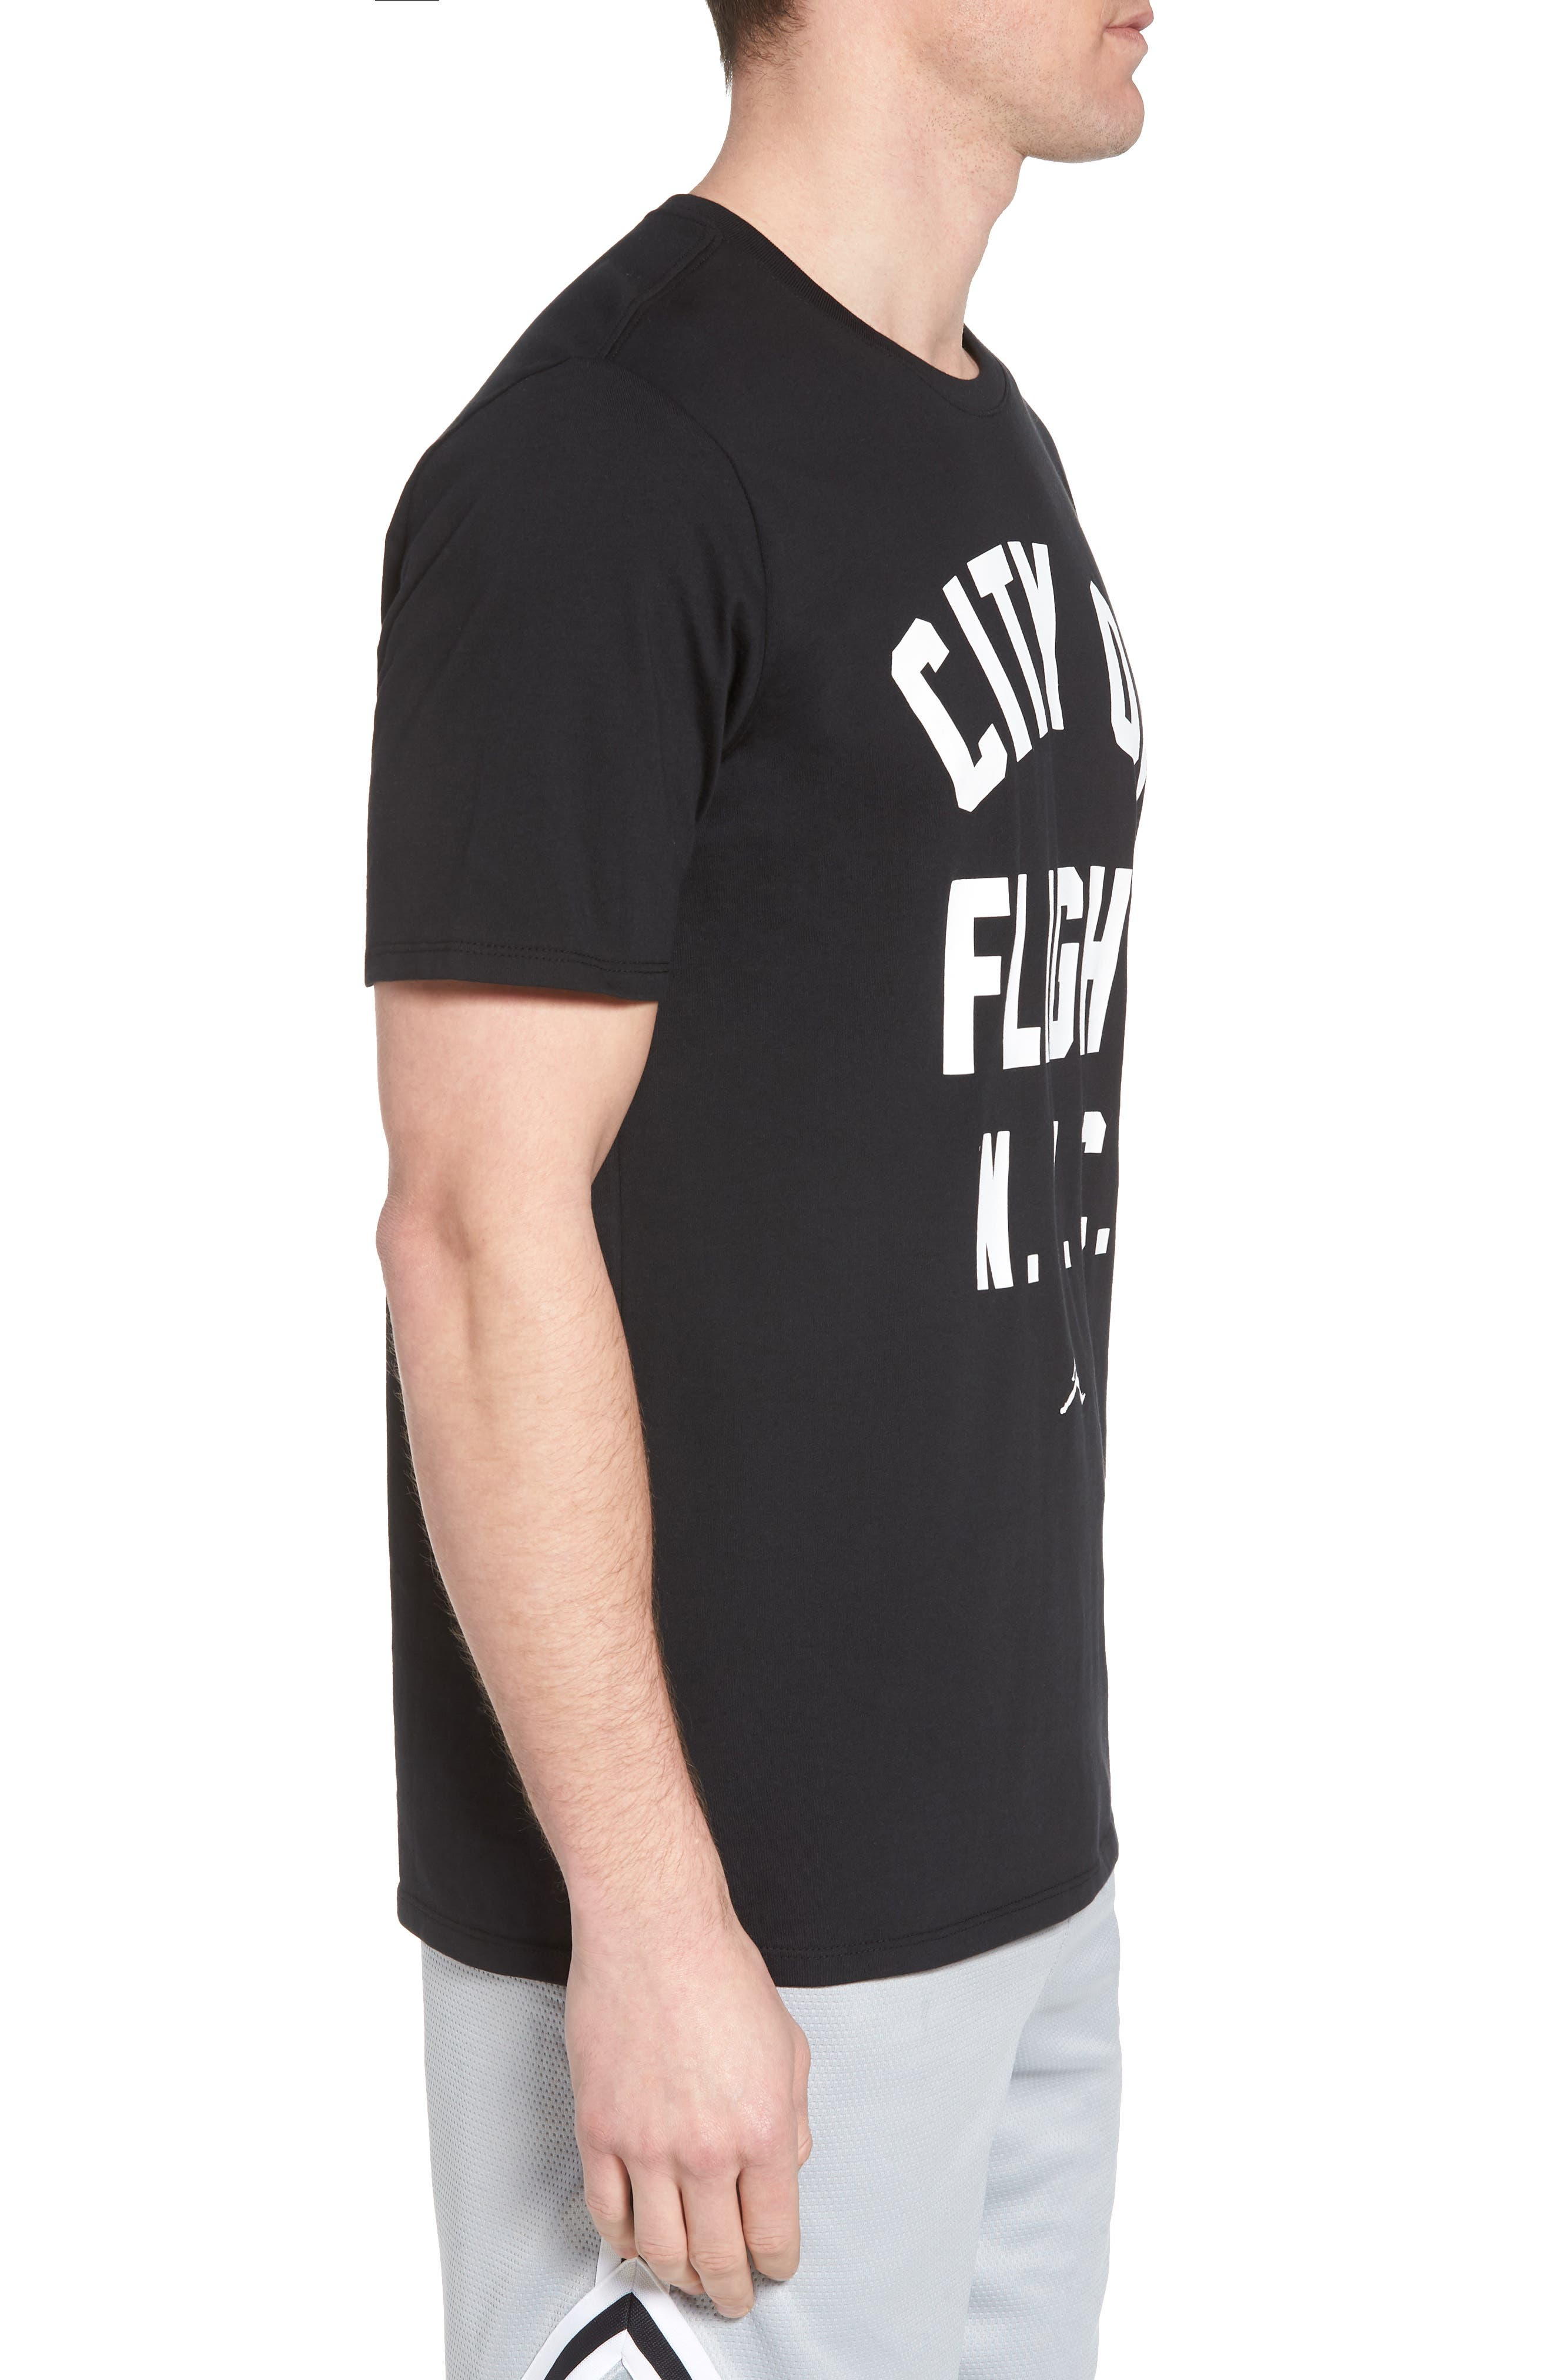 Sportswear City of Flight T-Shirt,                             Alternate thumbnail 3, color,                             Black/ White